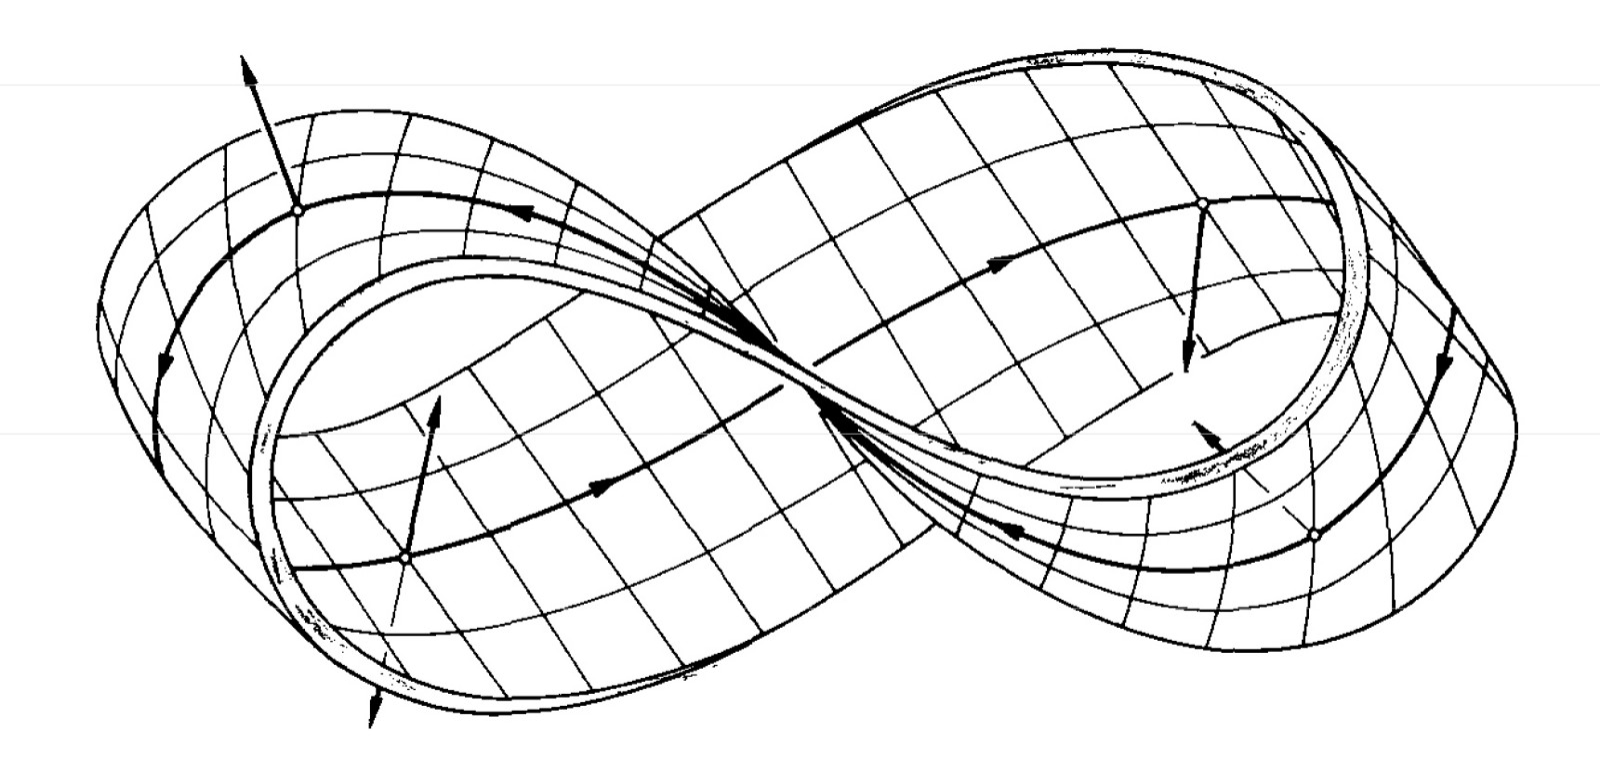 1963 – designscience